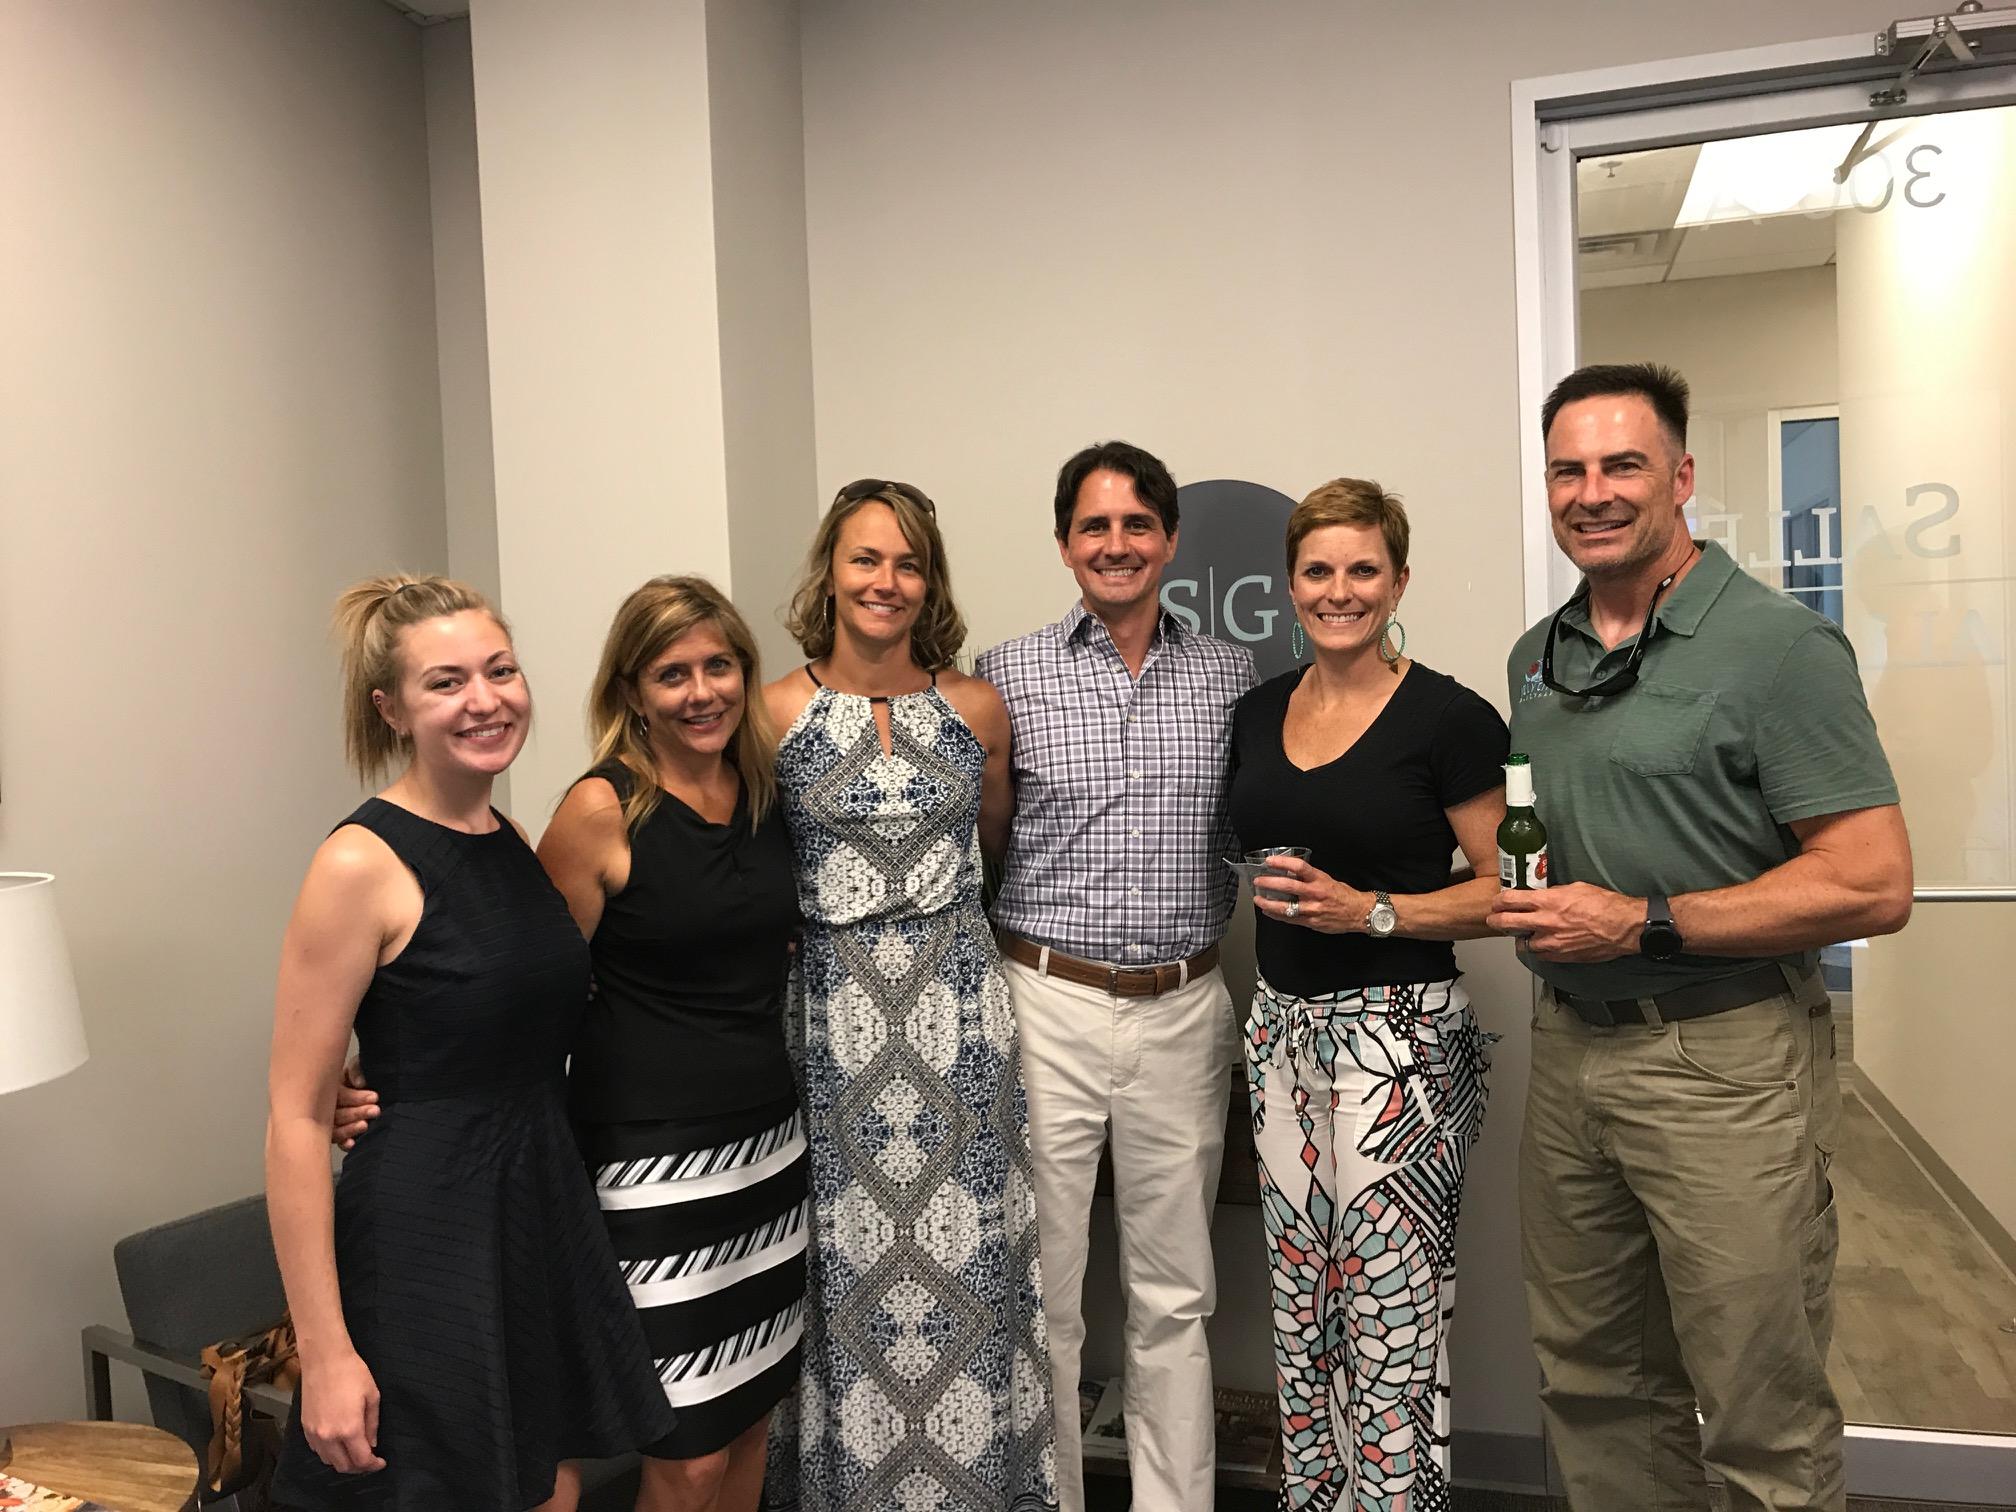 Emma Yocum, Beth Lee, April Galloway, Bret Galloway, Tracy Adams, Taylor Adams join in celebrating Salle Galloway's new Daniel Island office.